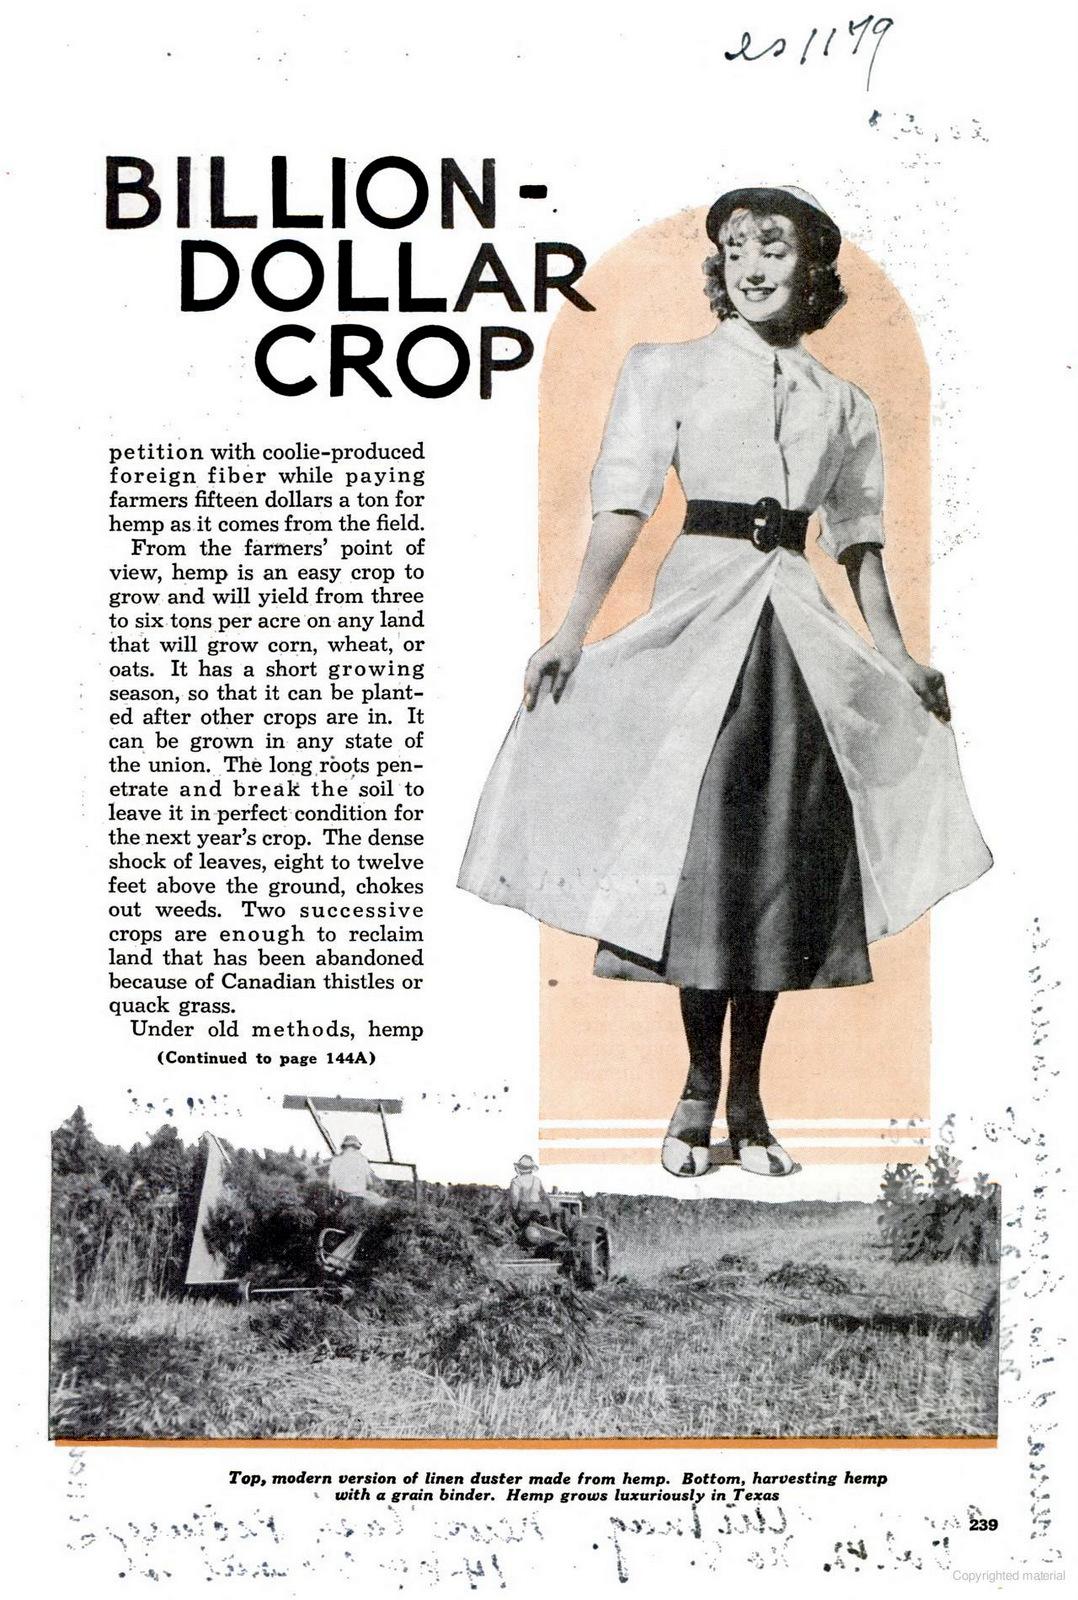 The Return Of Hemp, America's 'Billion-Dollar Crop' Books-001